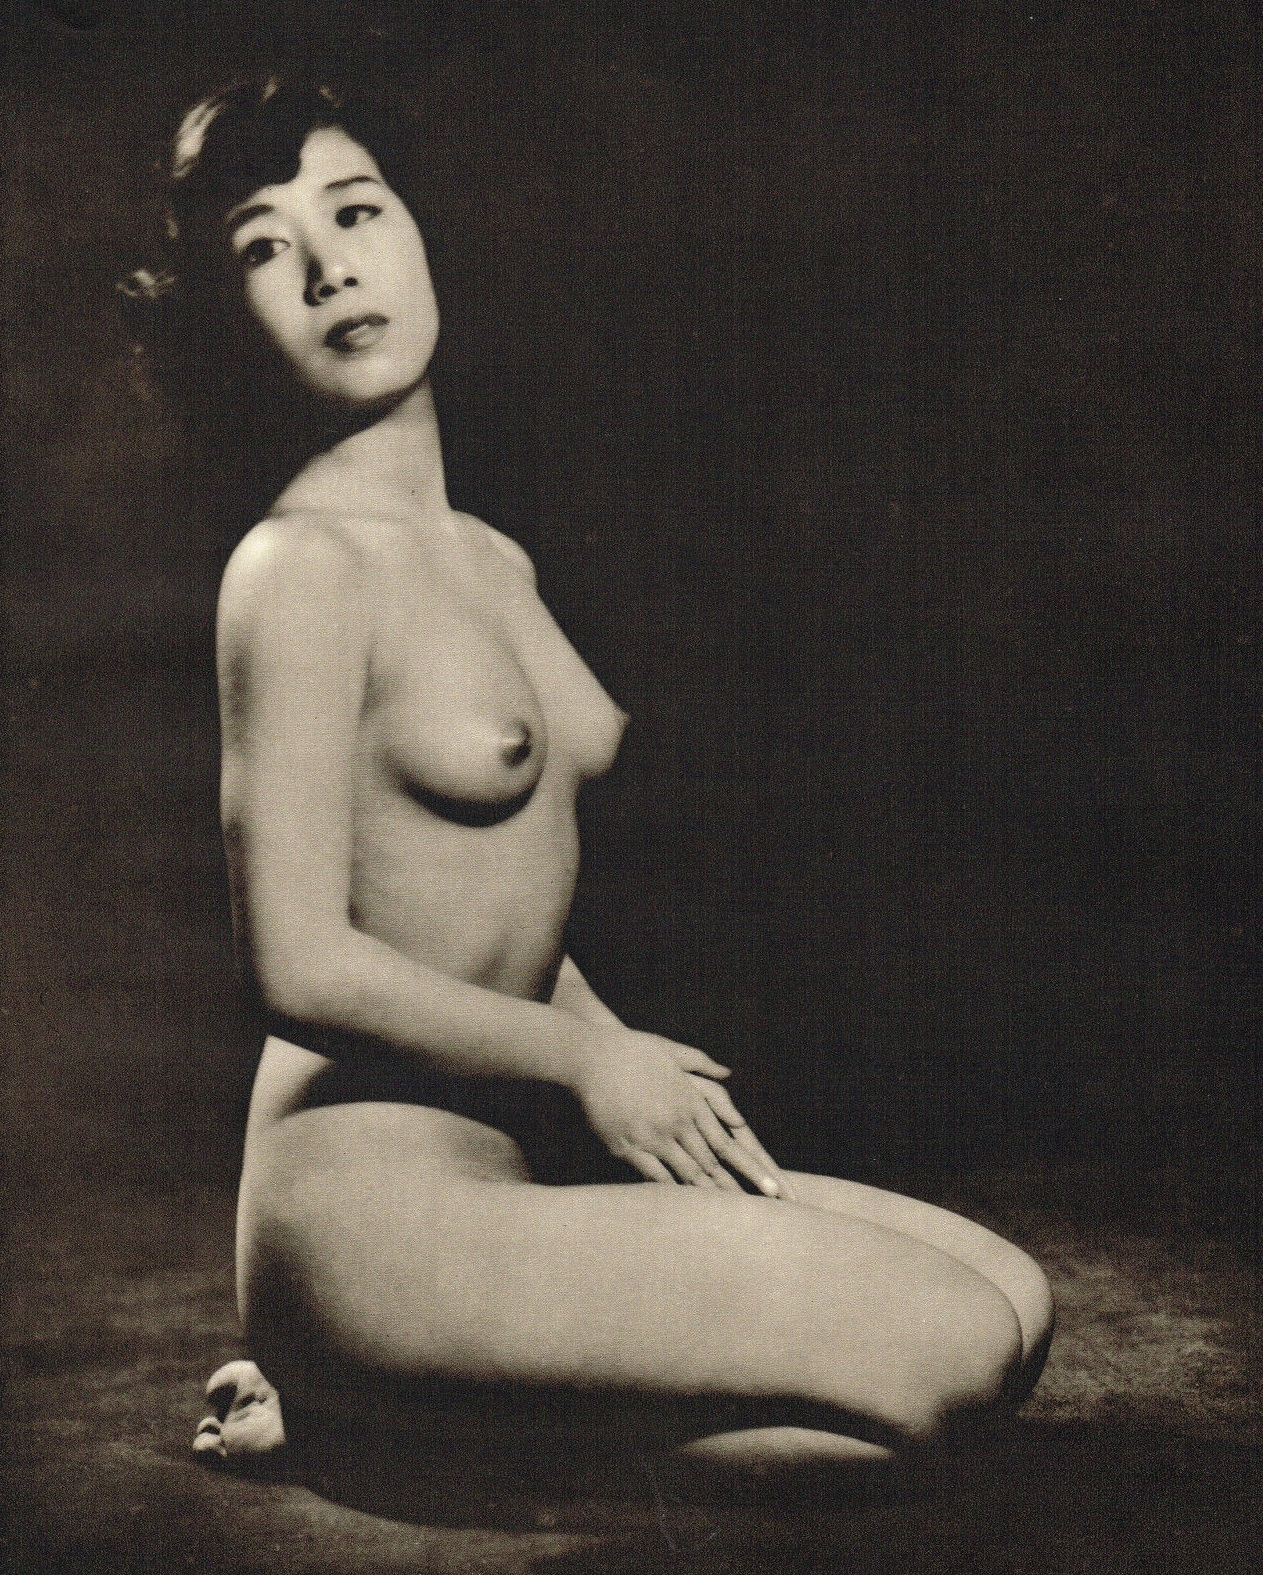 John Everard. Japanese kneeling Nude, photogravure 1950Oriental Model Published by Robert Hale Ltd., London in 1955.